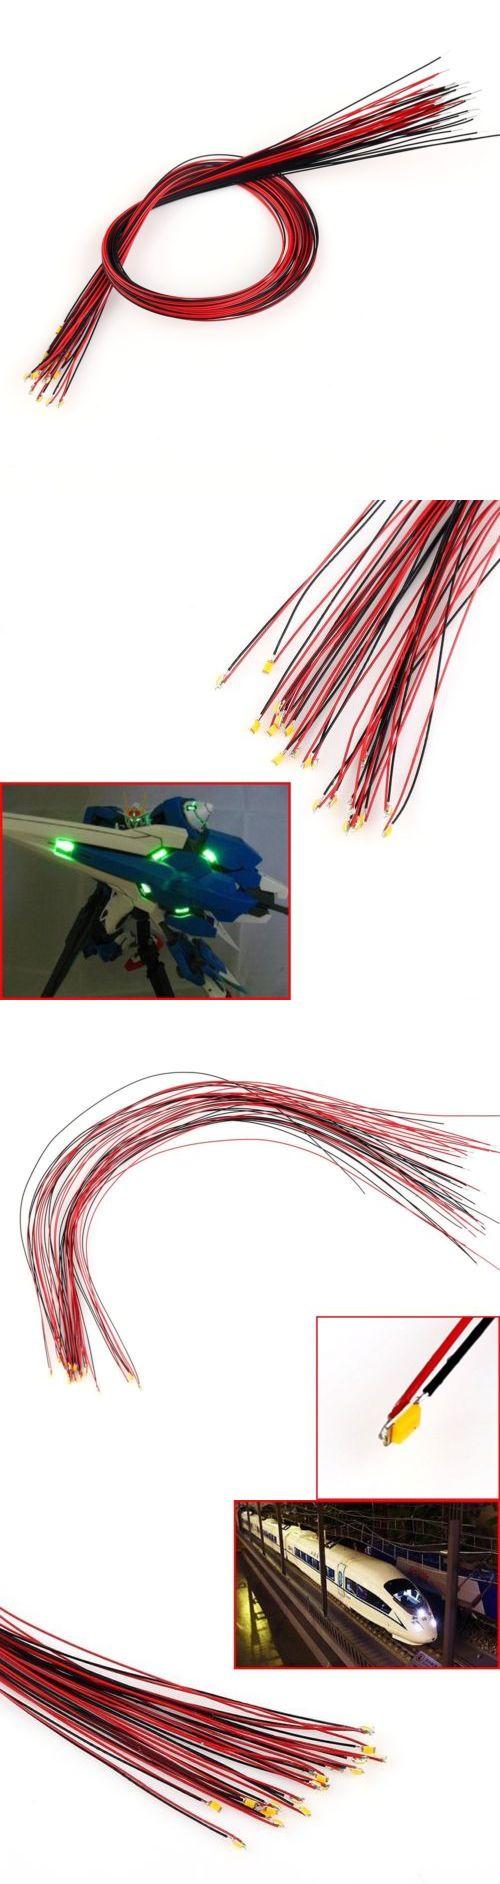 T0402WM 20pcs Pre-soldered micro litz wired leads Warm White